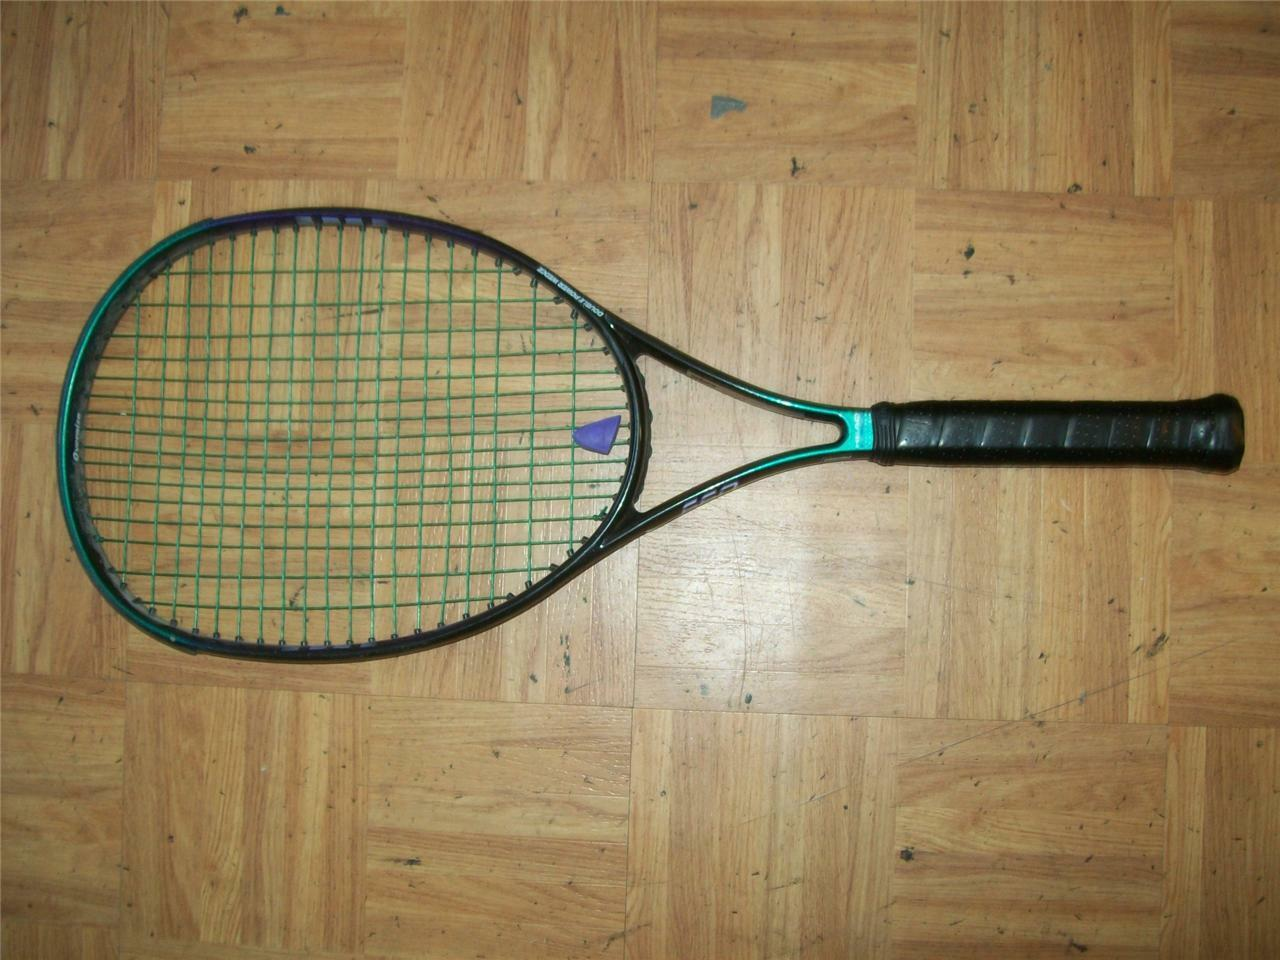 Cabeza Atlantis 660 Midplus 102 4 3 8 Grip Tenis Raqueta